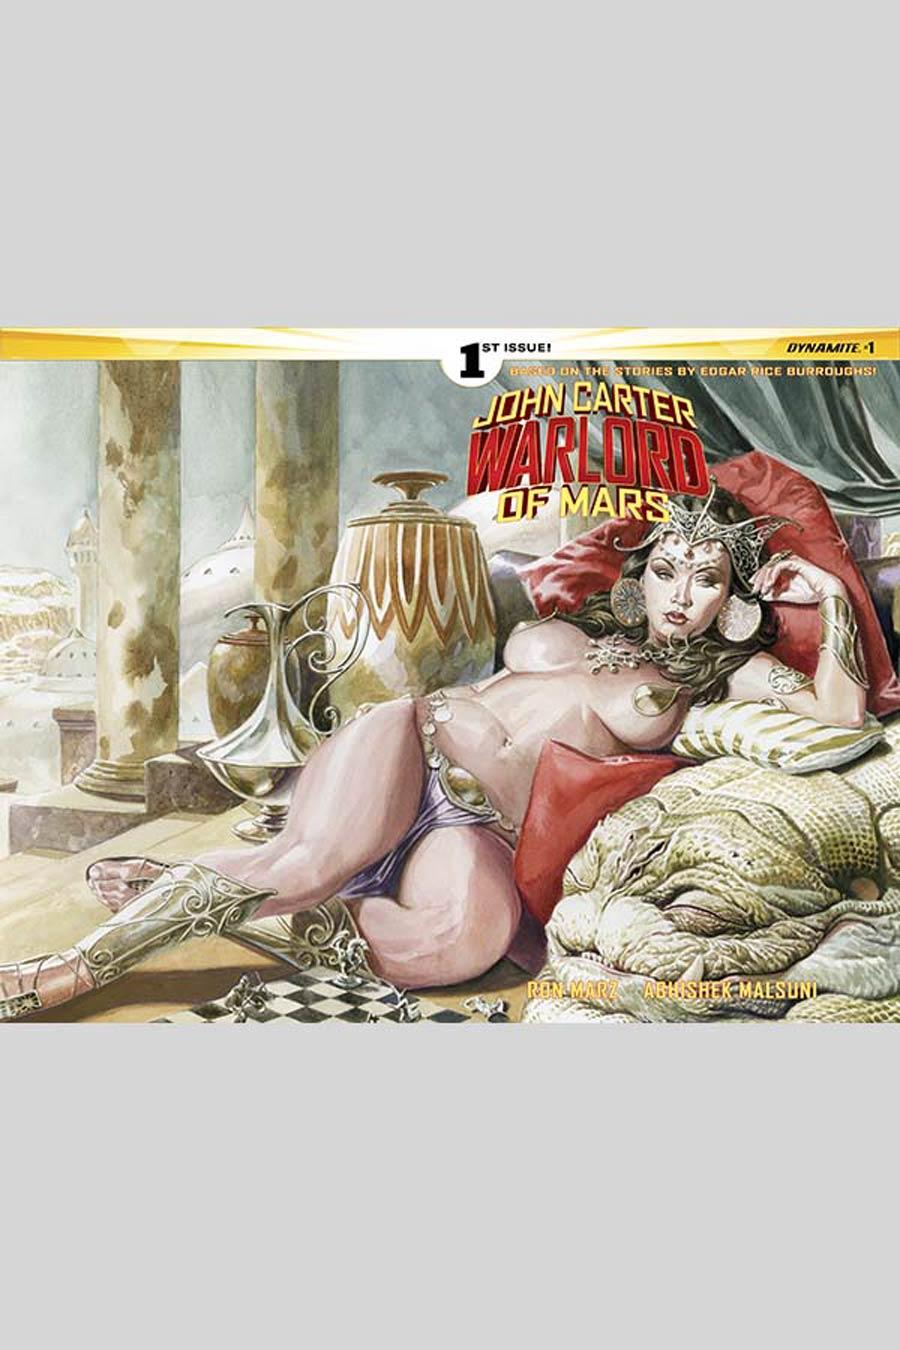 John Carter Warlord Of Mars Vol 2 #1 Cover C Variant JG Jones Wraparound Cover